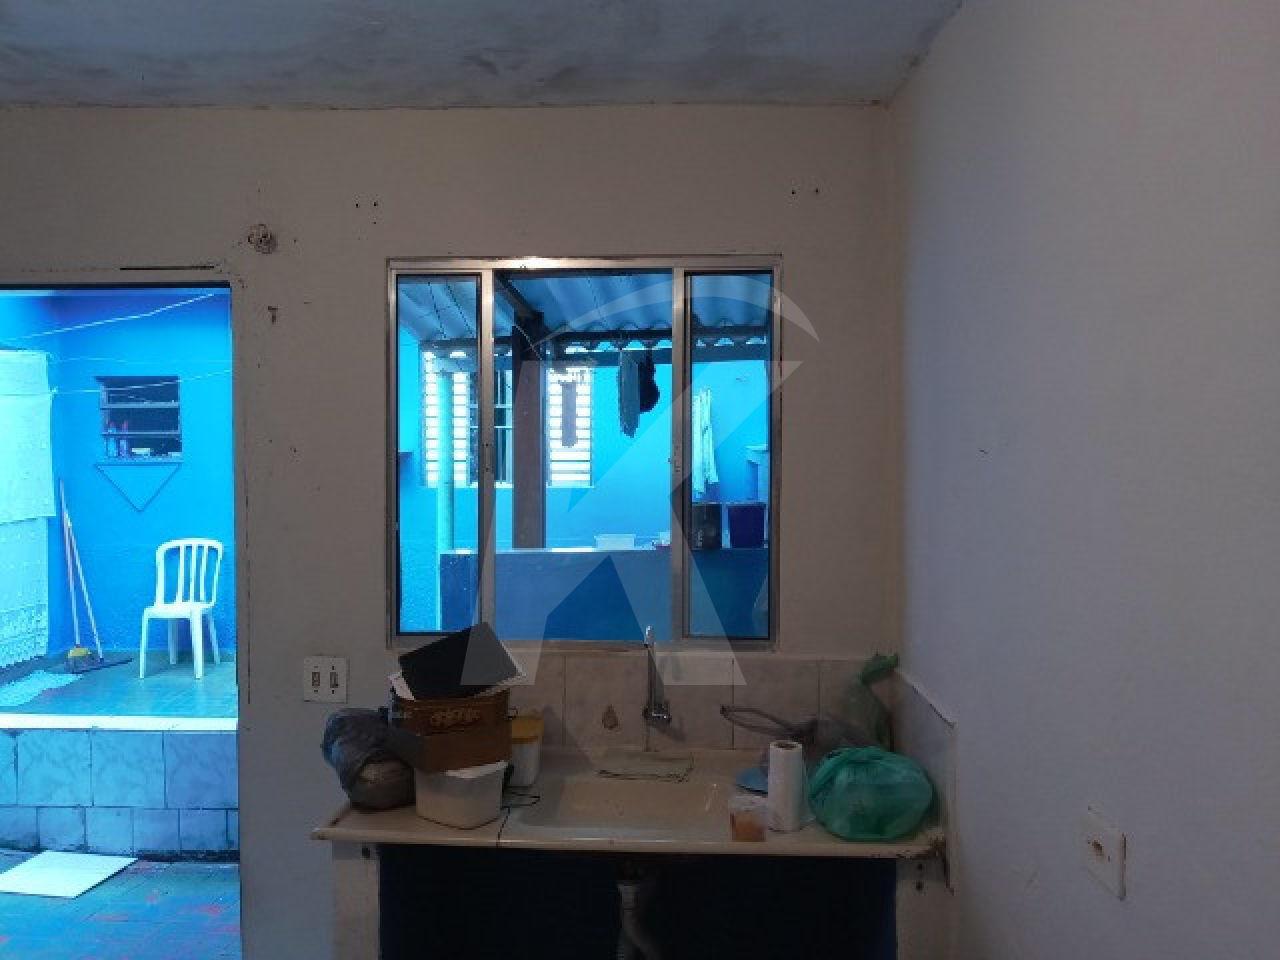 Casa  Parque Edu Chaves - 2 Dormitório(s) - São Paulo - SP - REF. KA13122